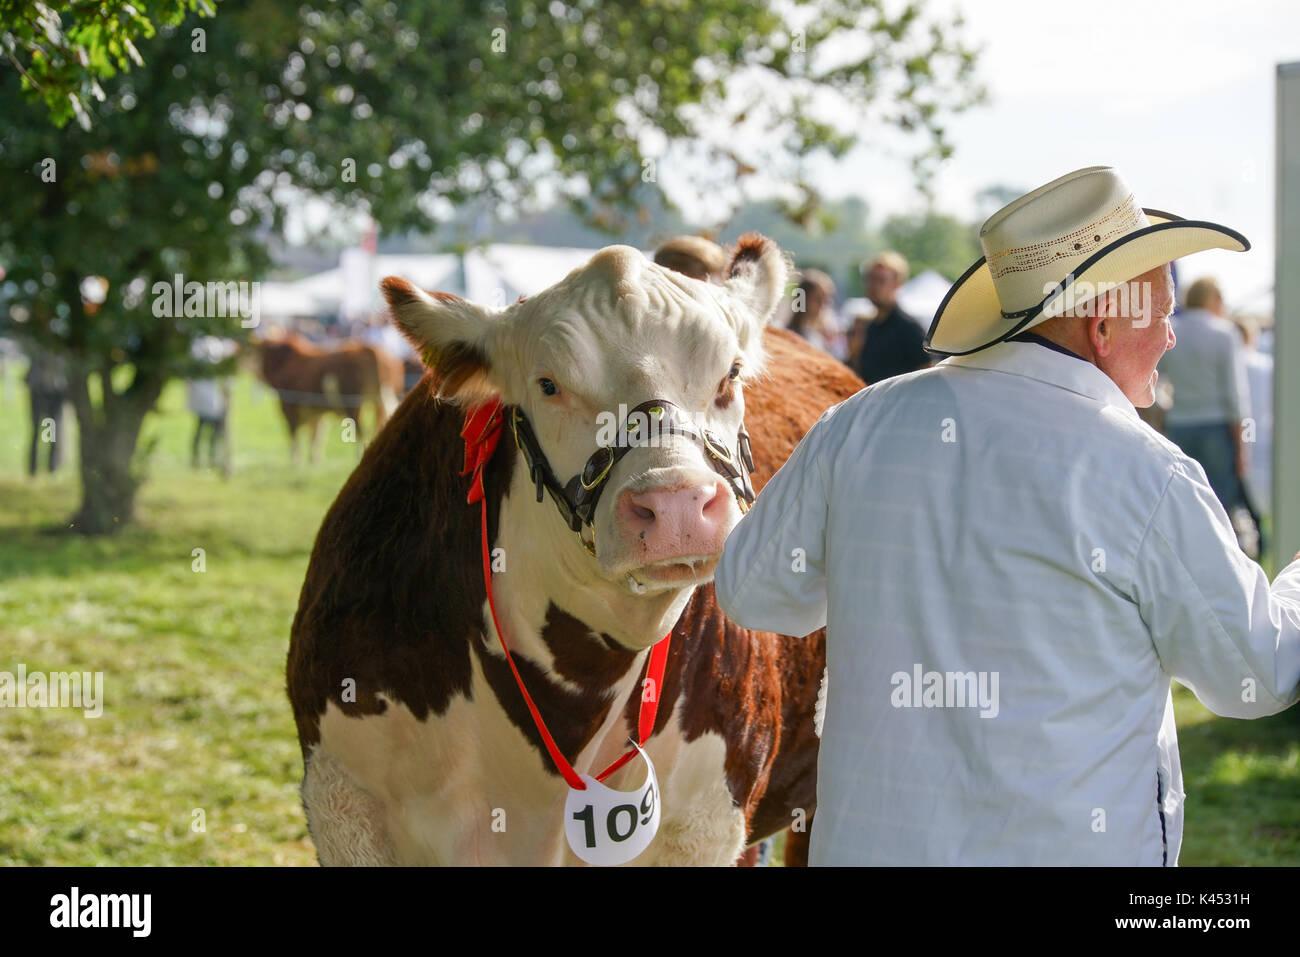 The Bucks Country Show Stock Photo